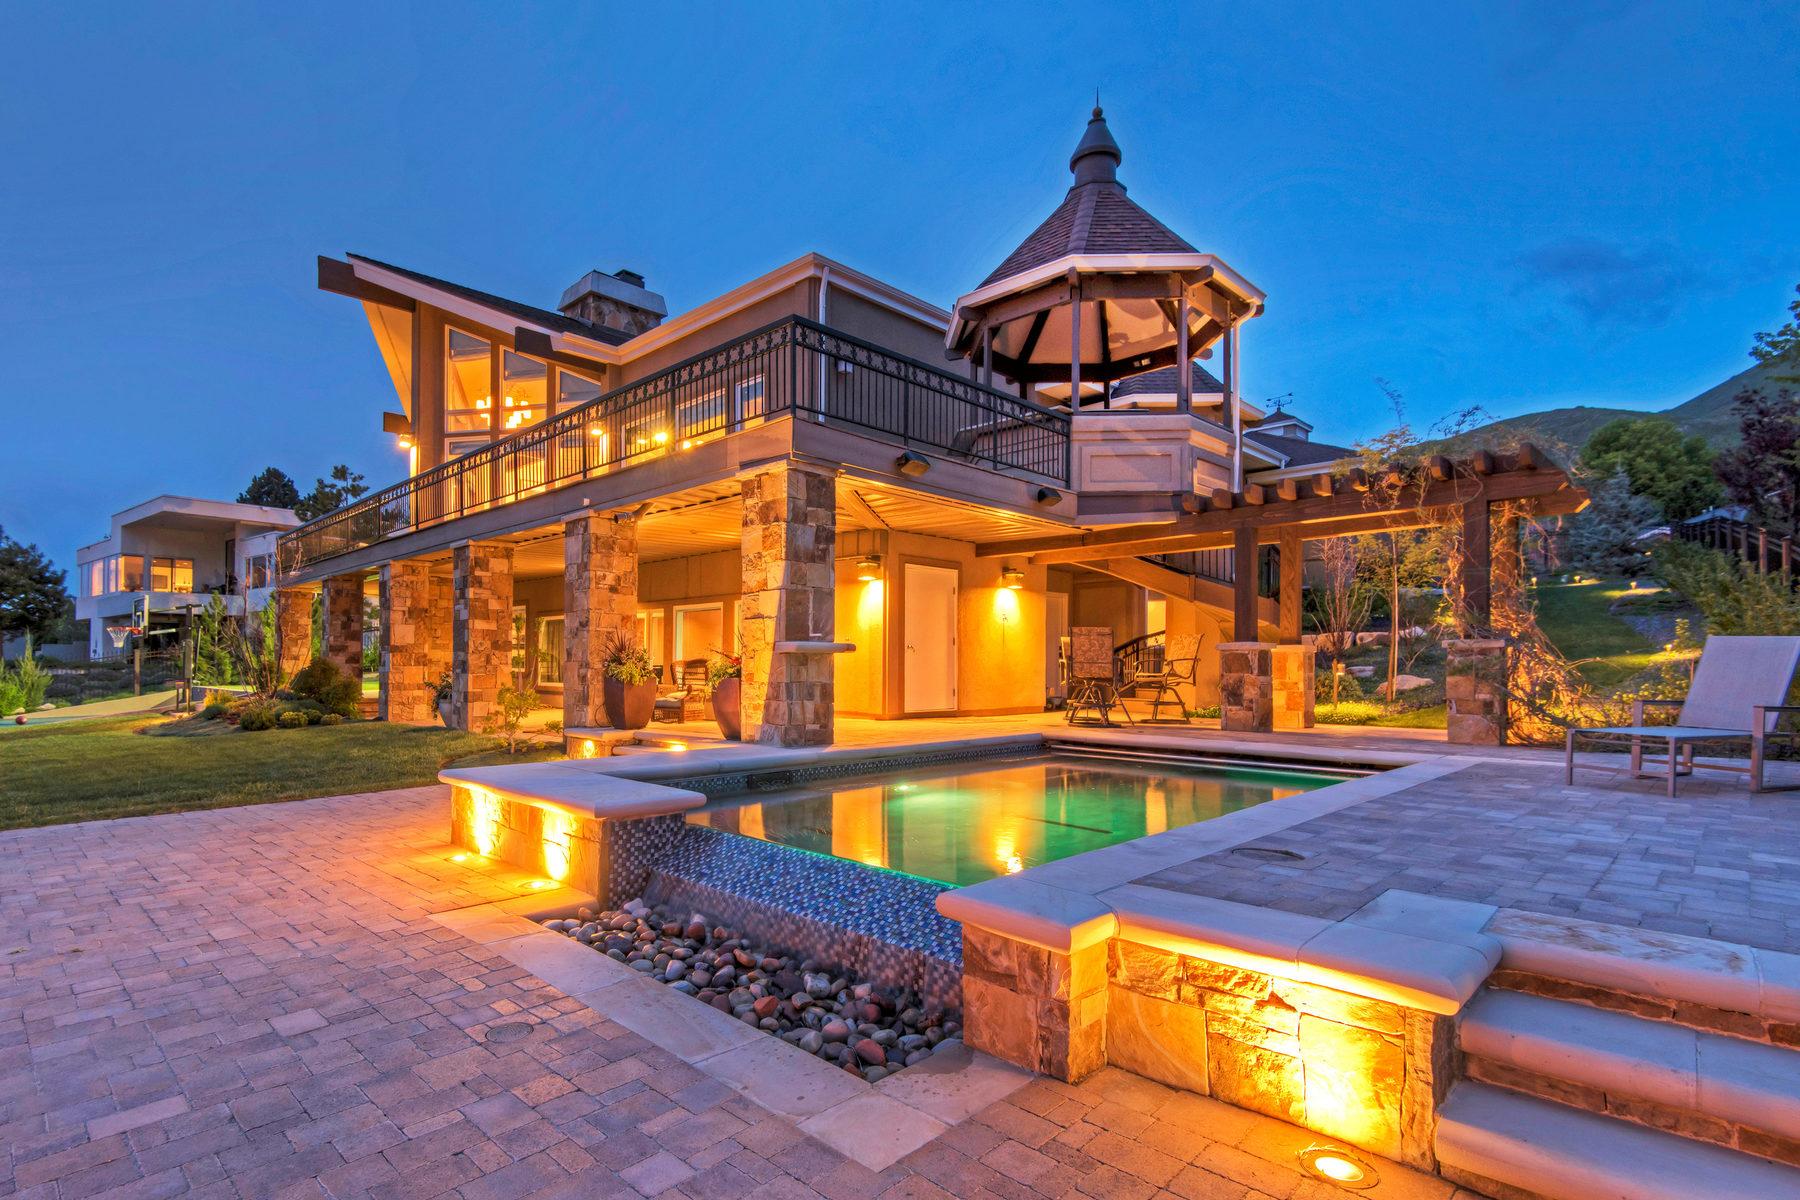 独户住宅 为 销售 在 Completely Remodeled 1430 E Perrys Hollow Dr 盐湖城市, 犹他州, 84103 美国